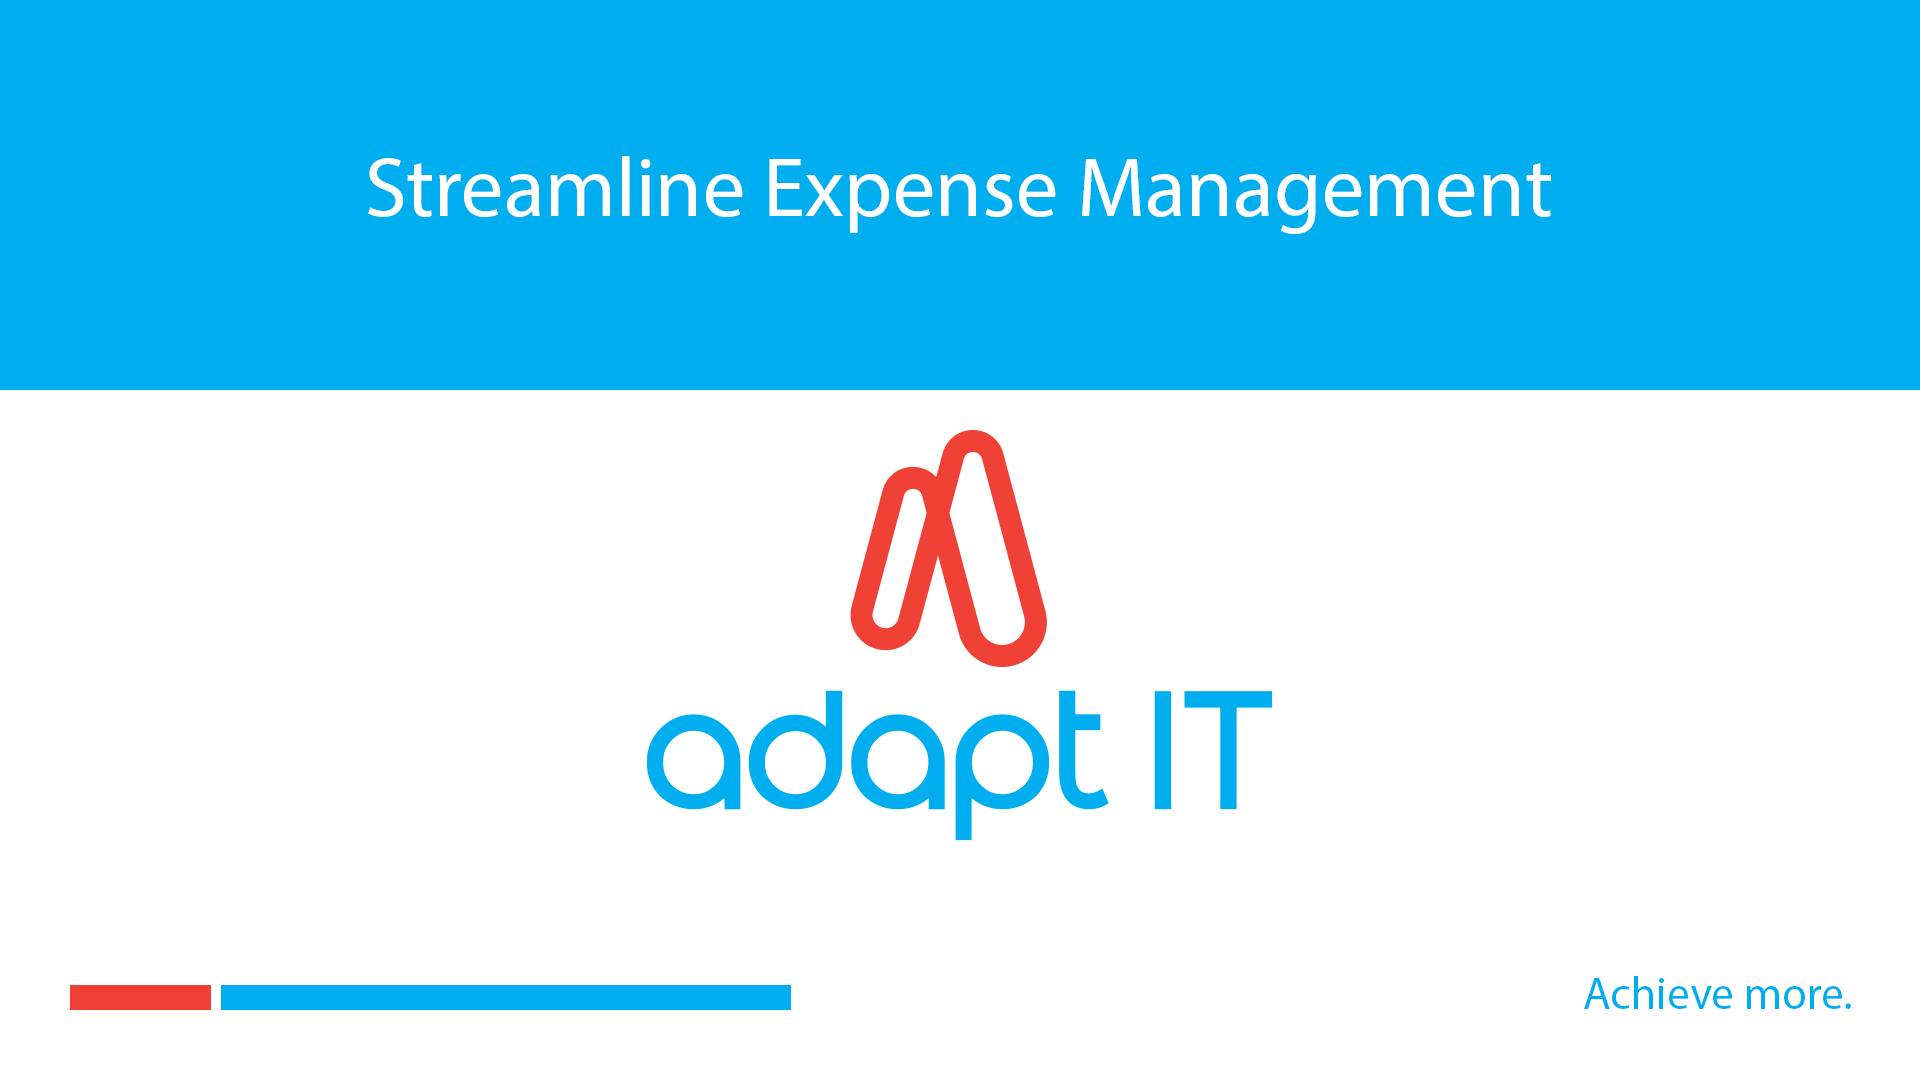 Streamline Expense Management